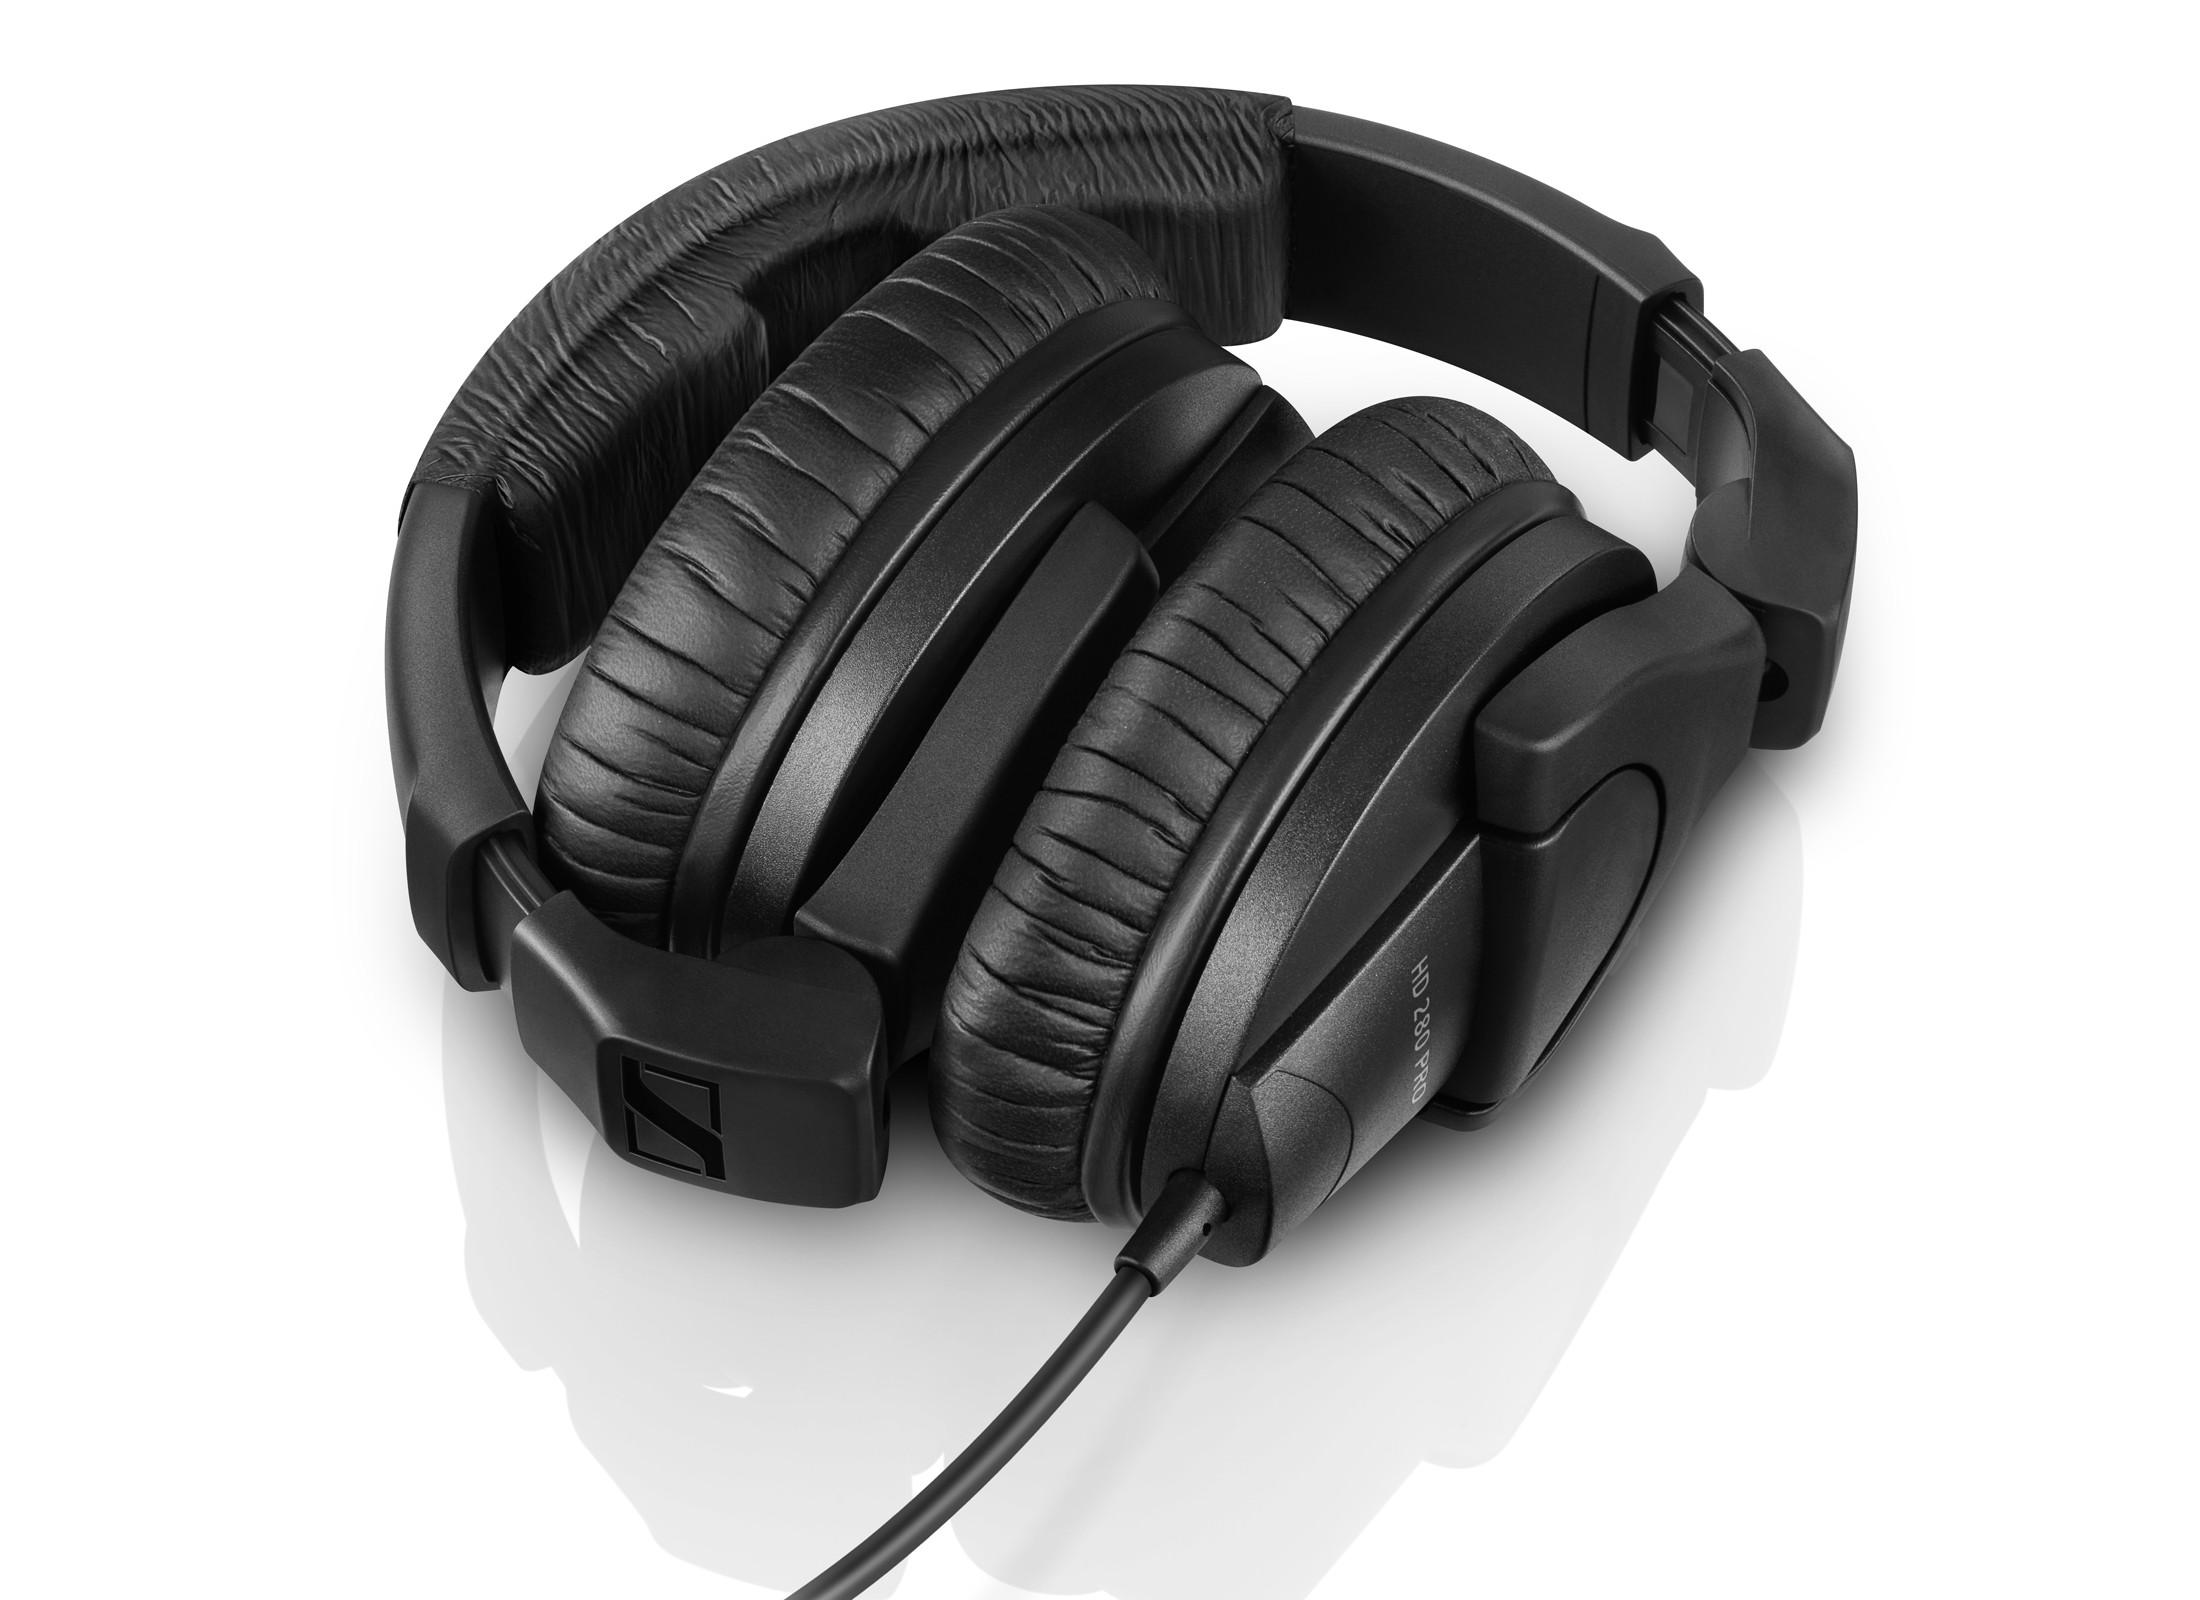 Sennheiser HD 280 Pro MKII Headphones Online At Low Prices At Huss ...